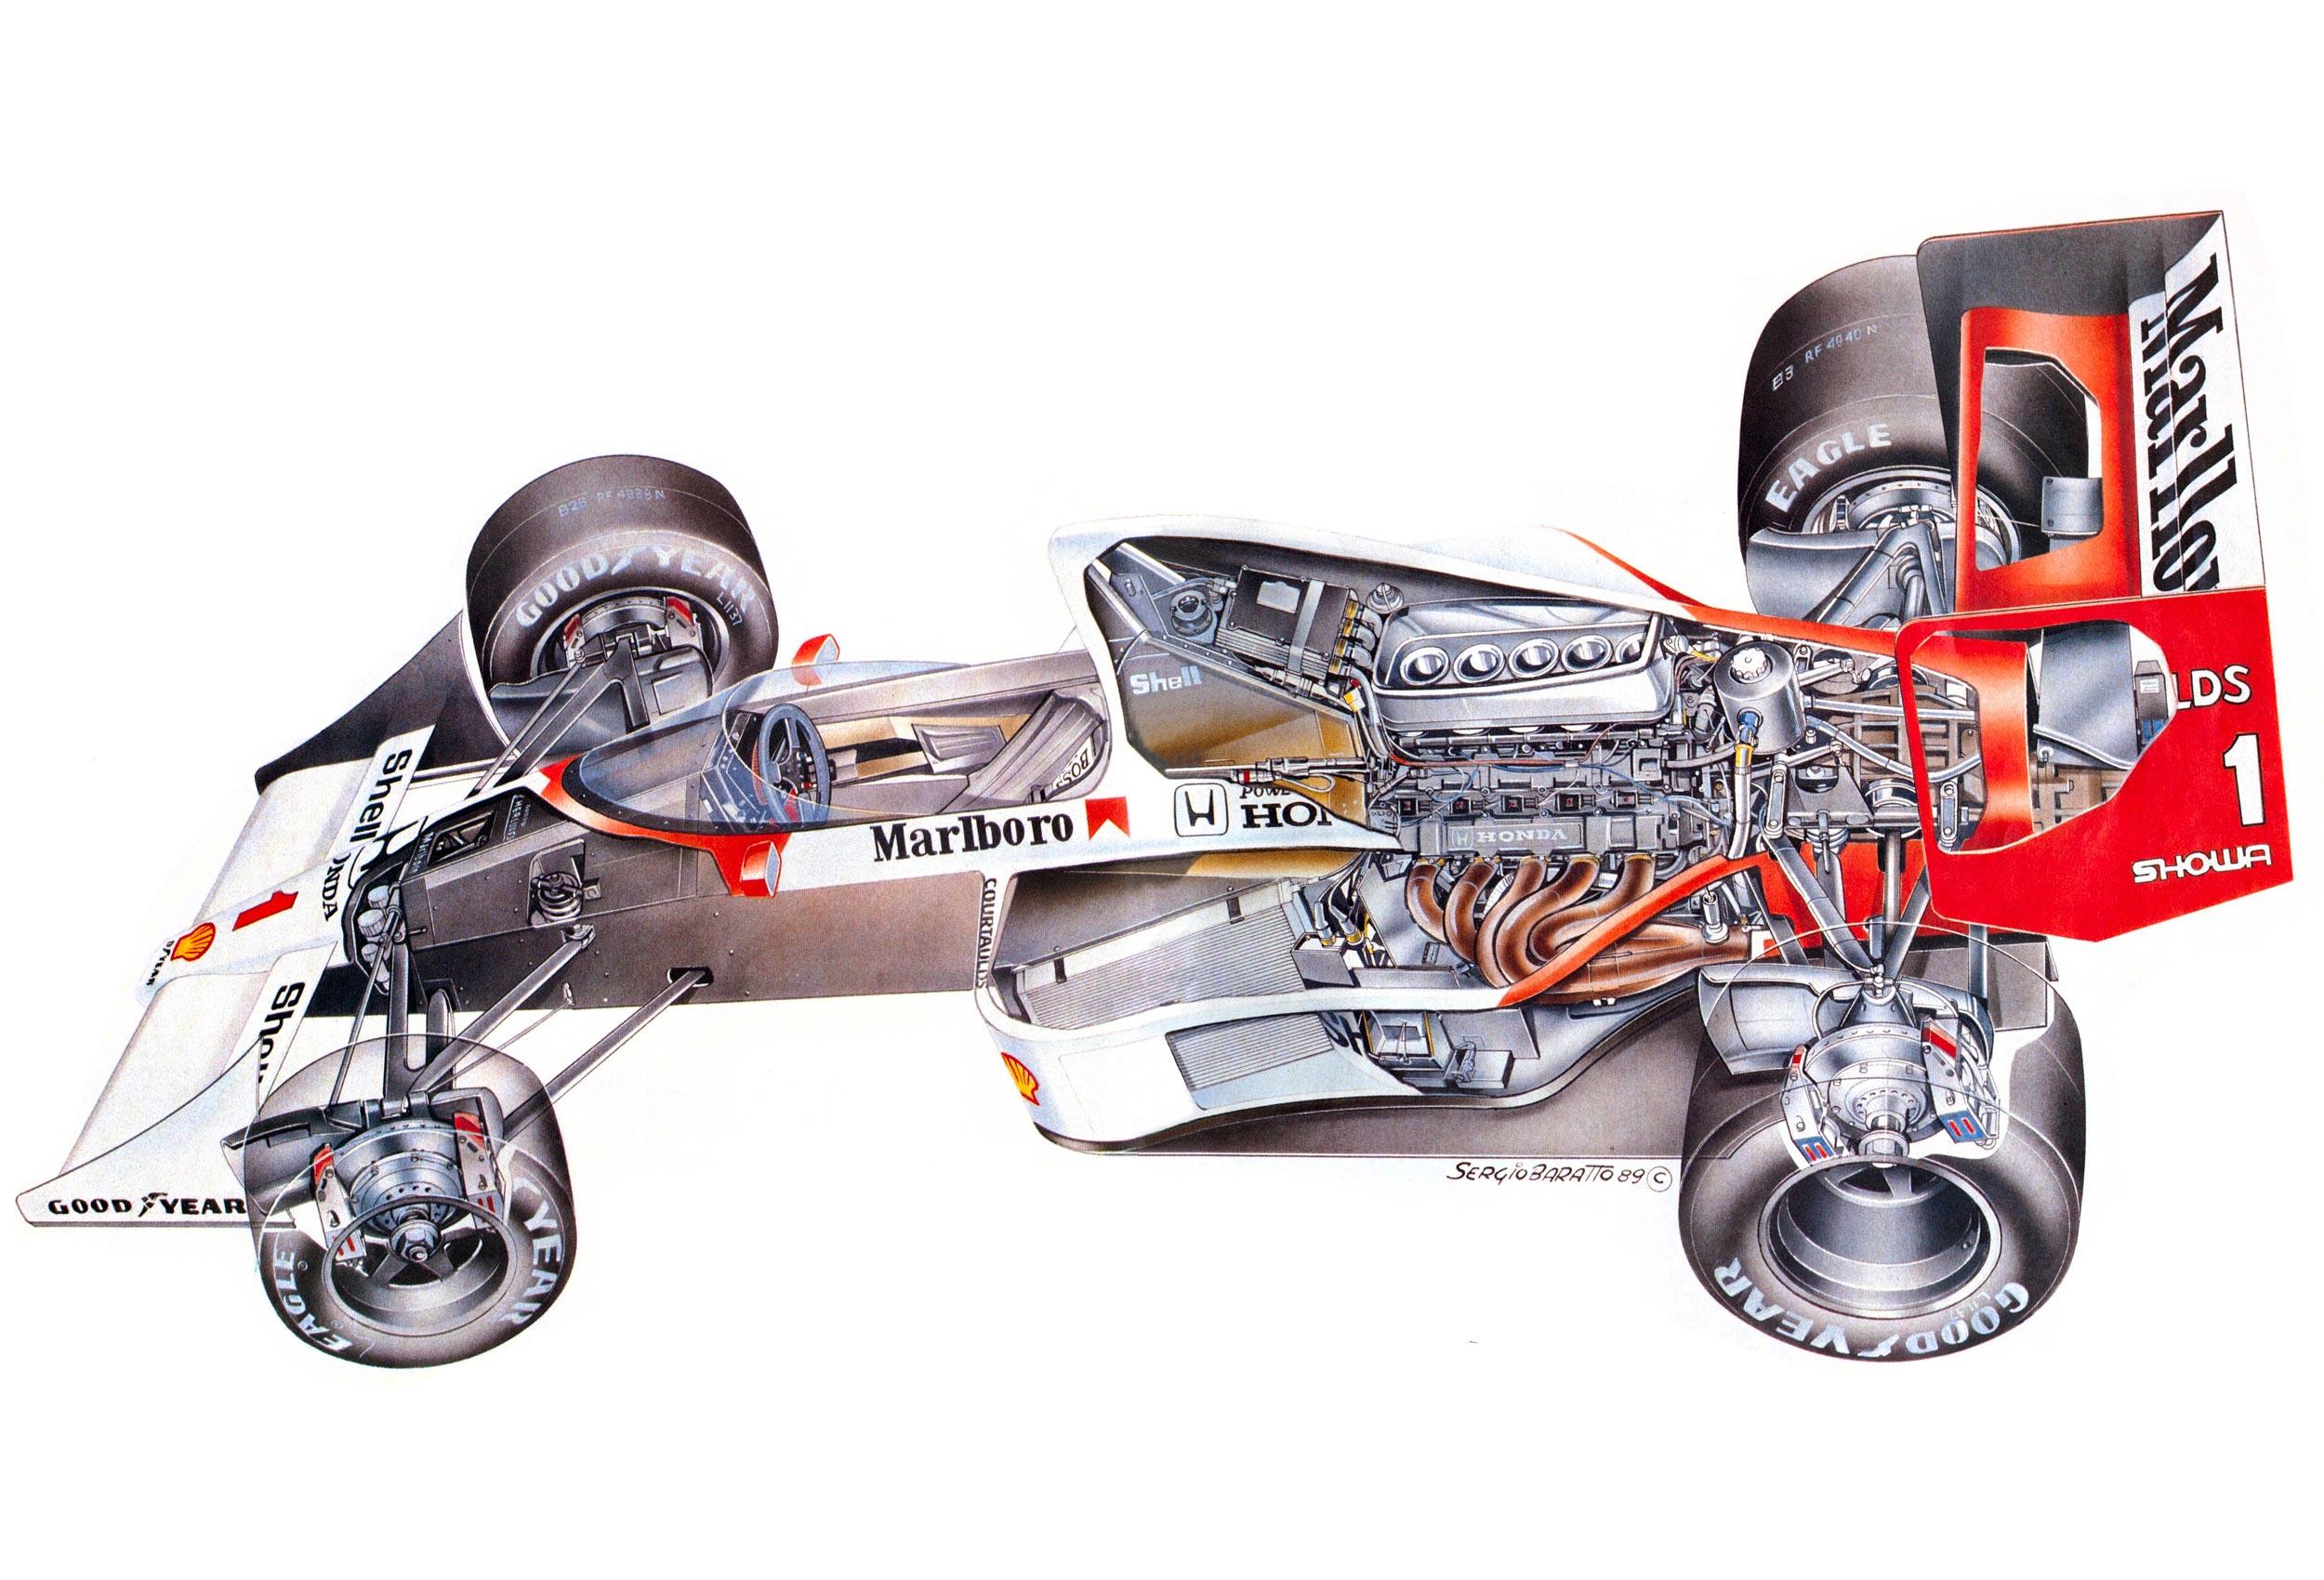 McLaren MP4/5 cutaway drawing